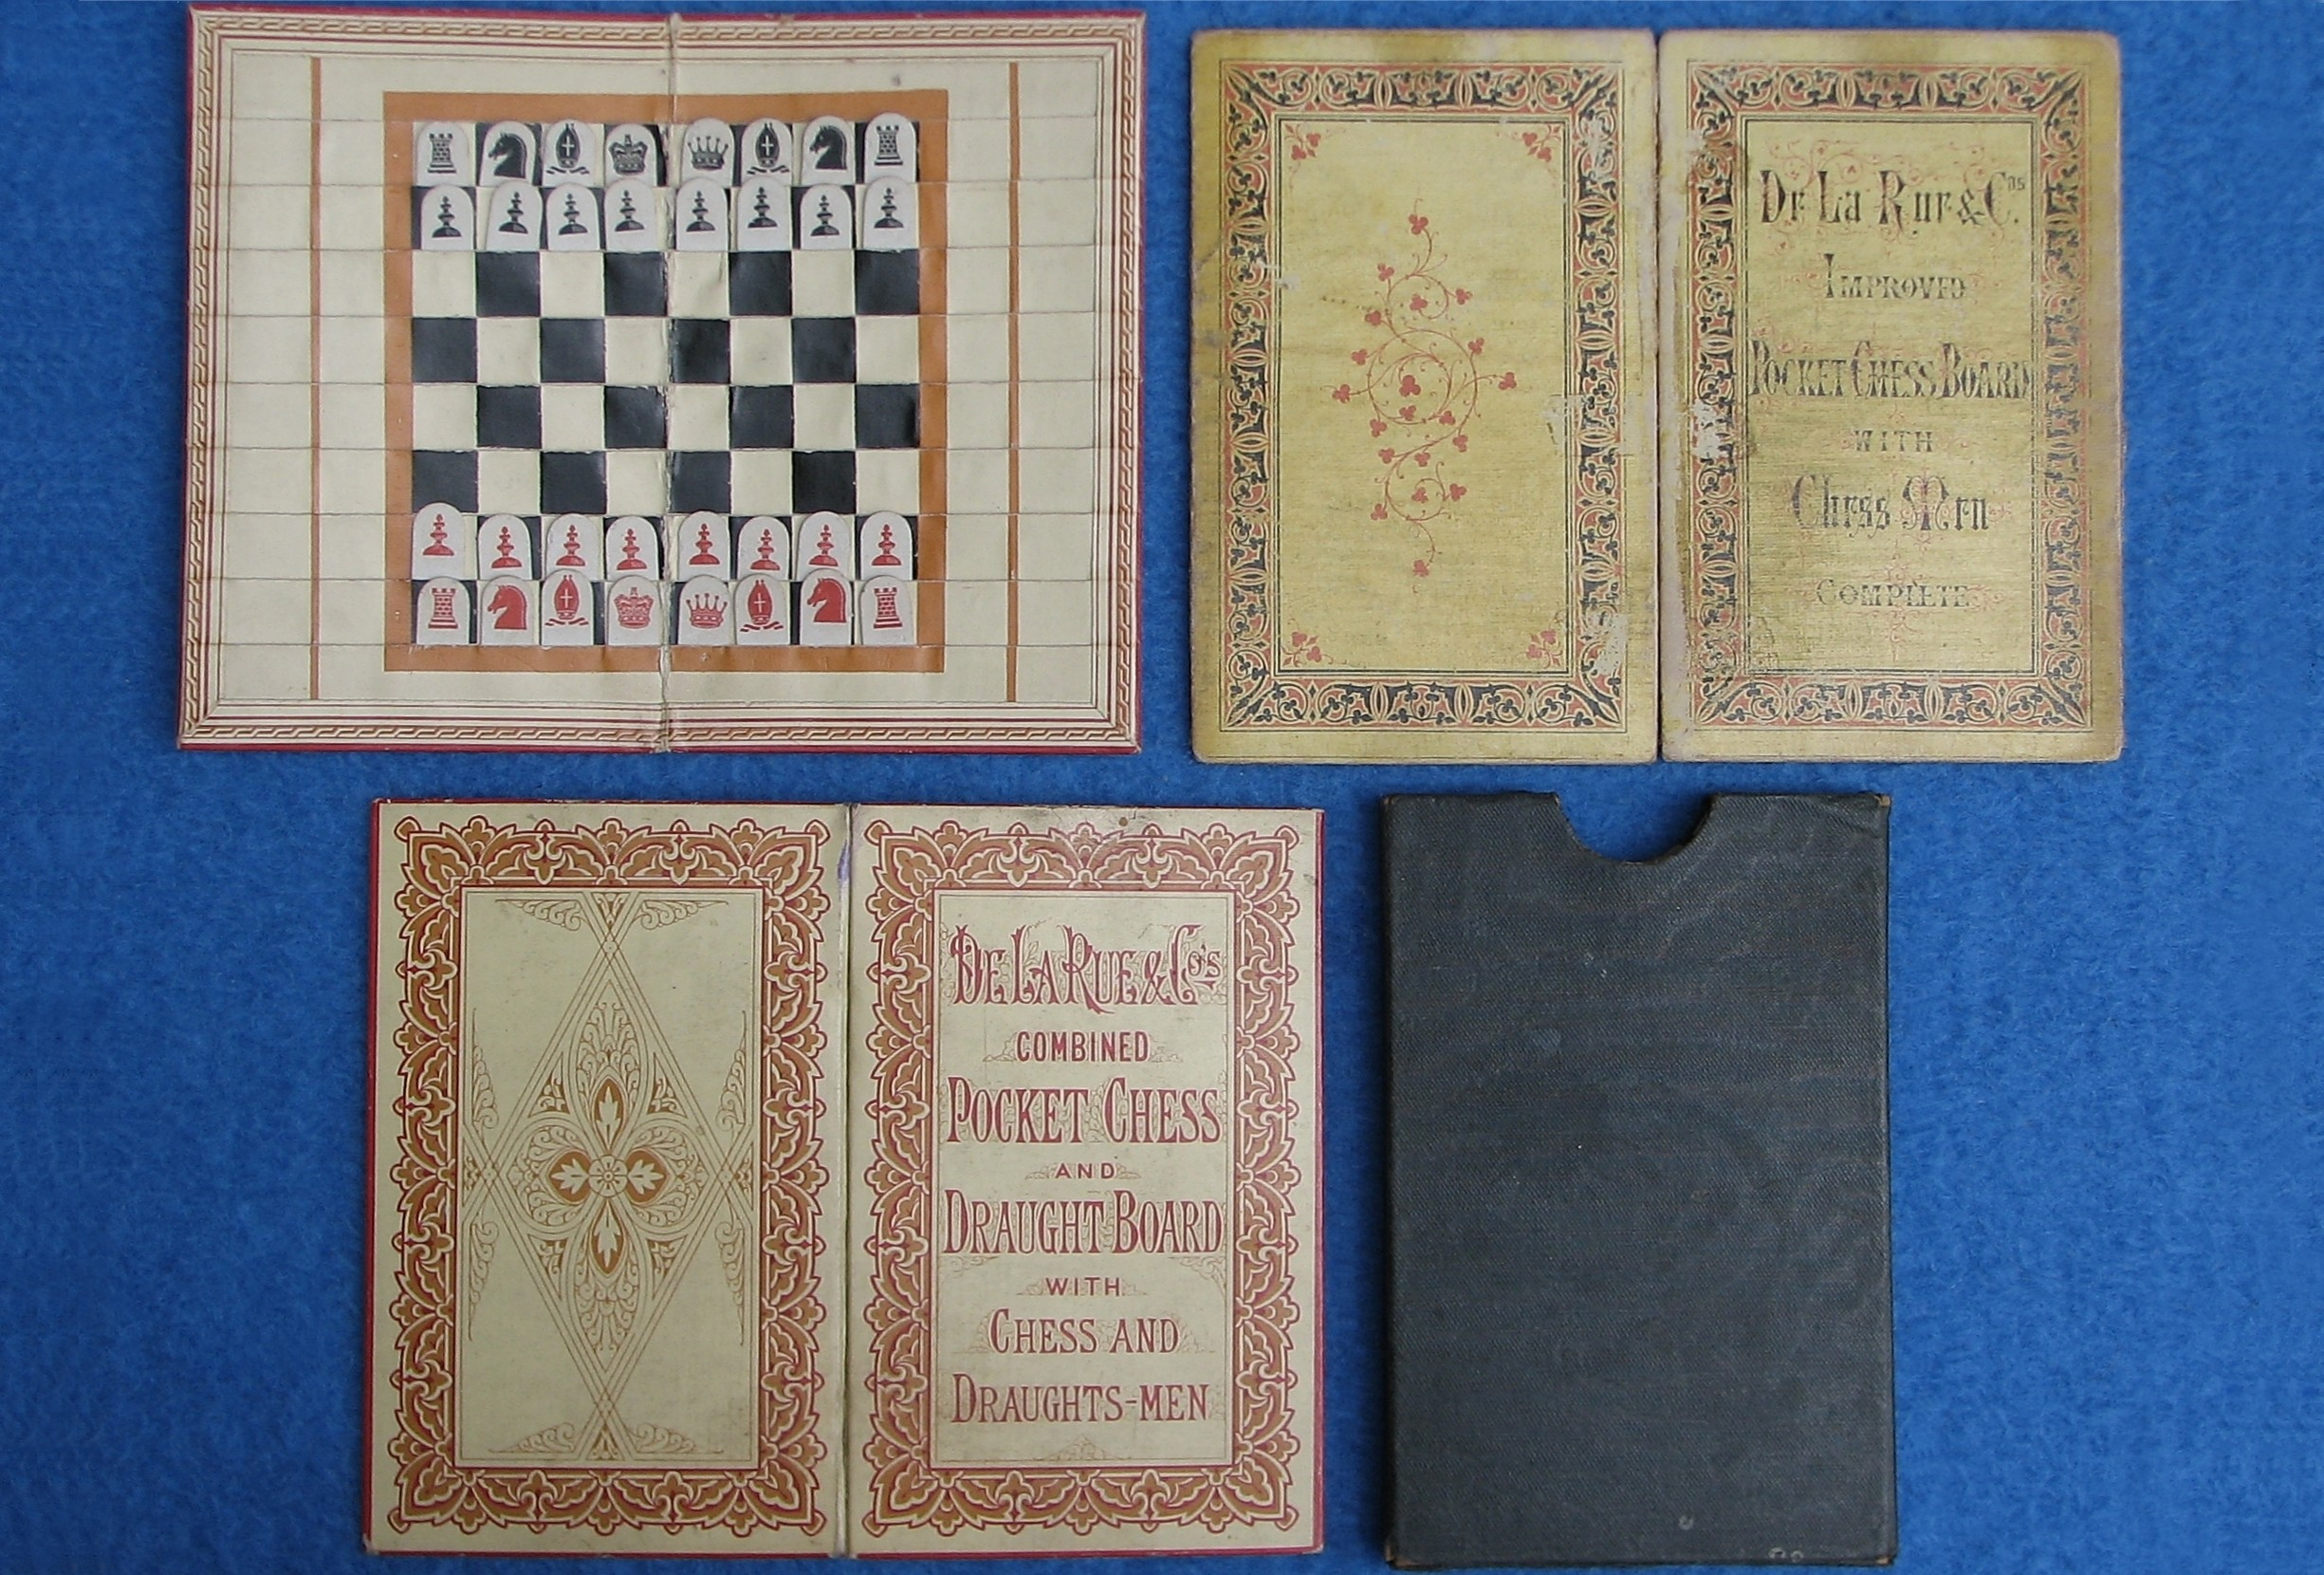 Symbols and figurines schaak museum 161 01 biocorpaavc Gallery